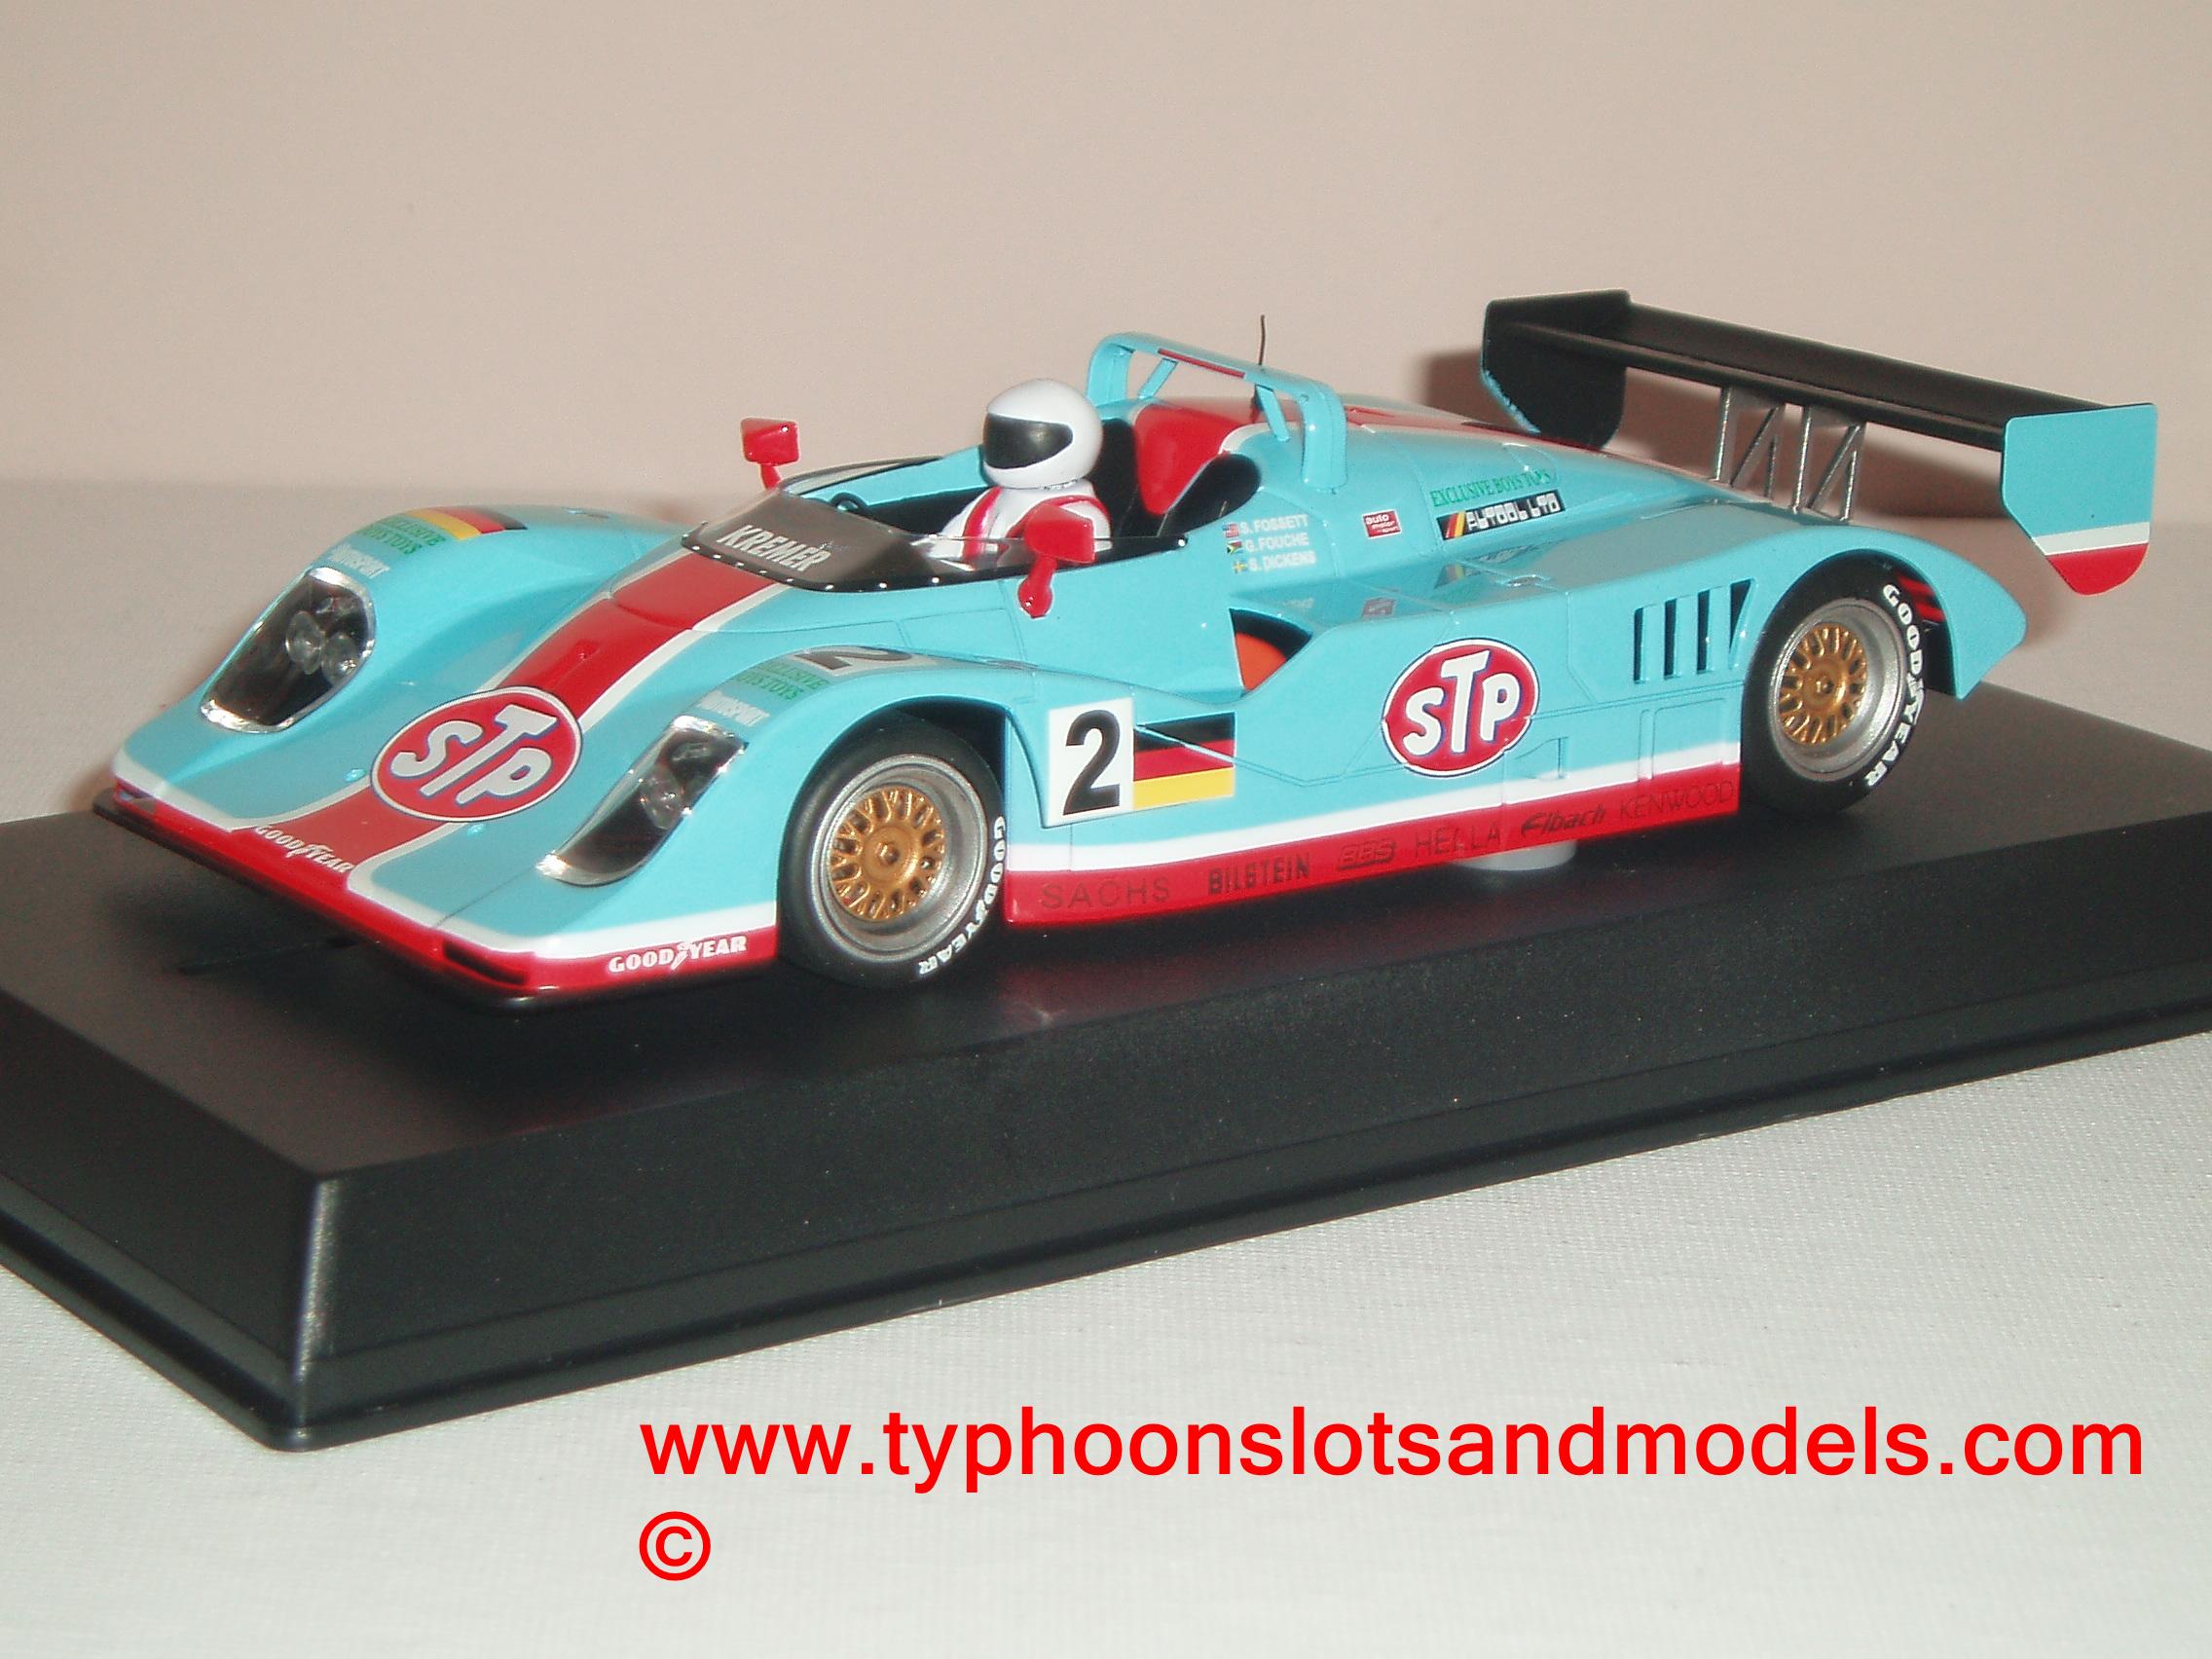 51301 Avant Slot Porsche Kremer 8 - STP - New & Boxed - 51301